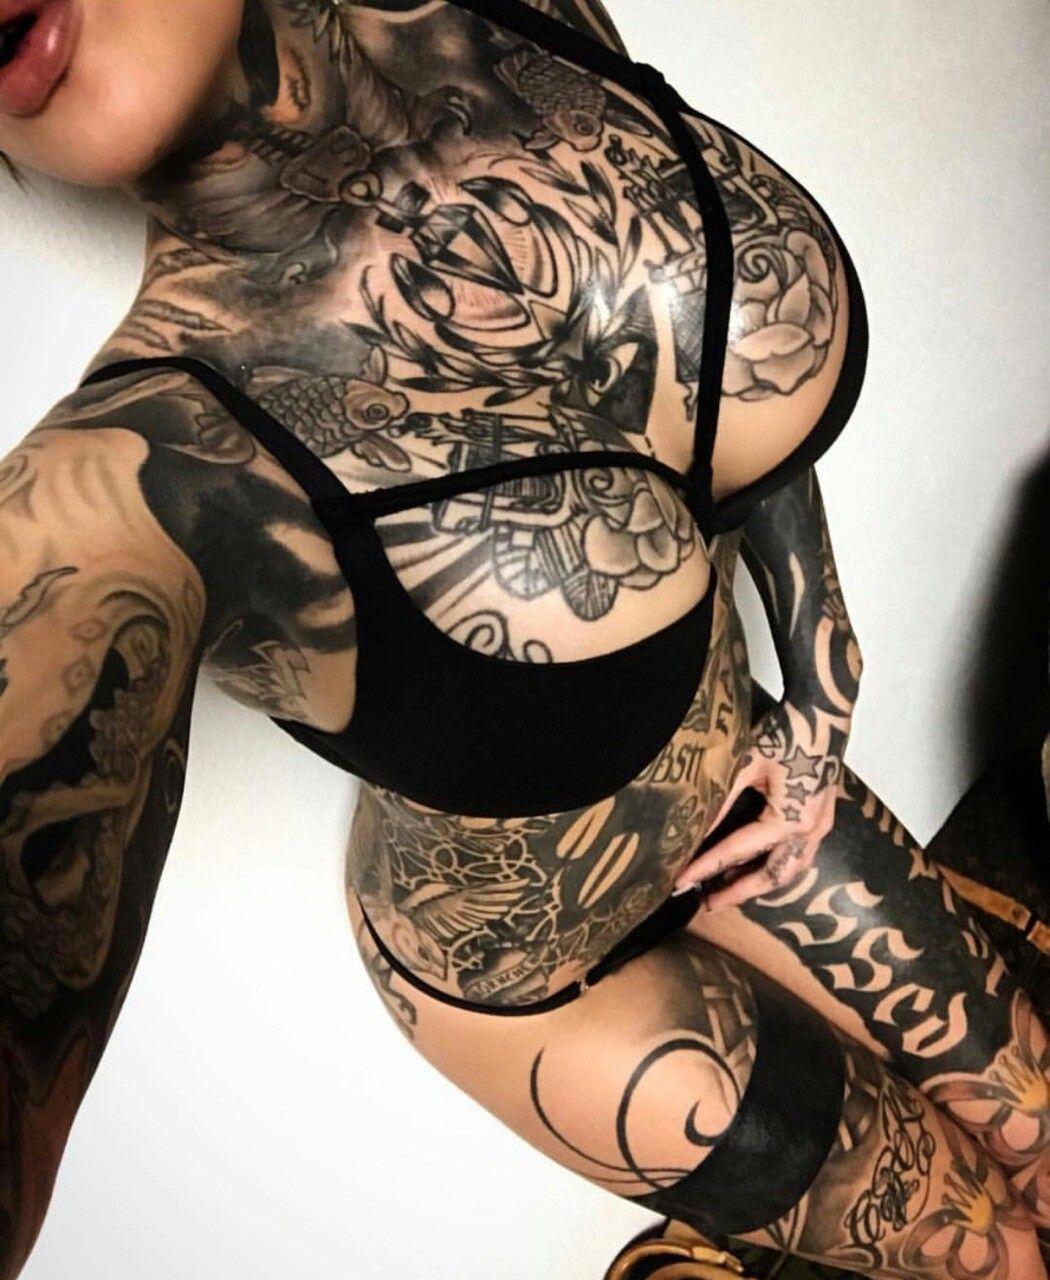 Tattoo old school tatuaggi old school pin up significato e foto quotes - Love This Leg Stocking Tattoo Idea